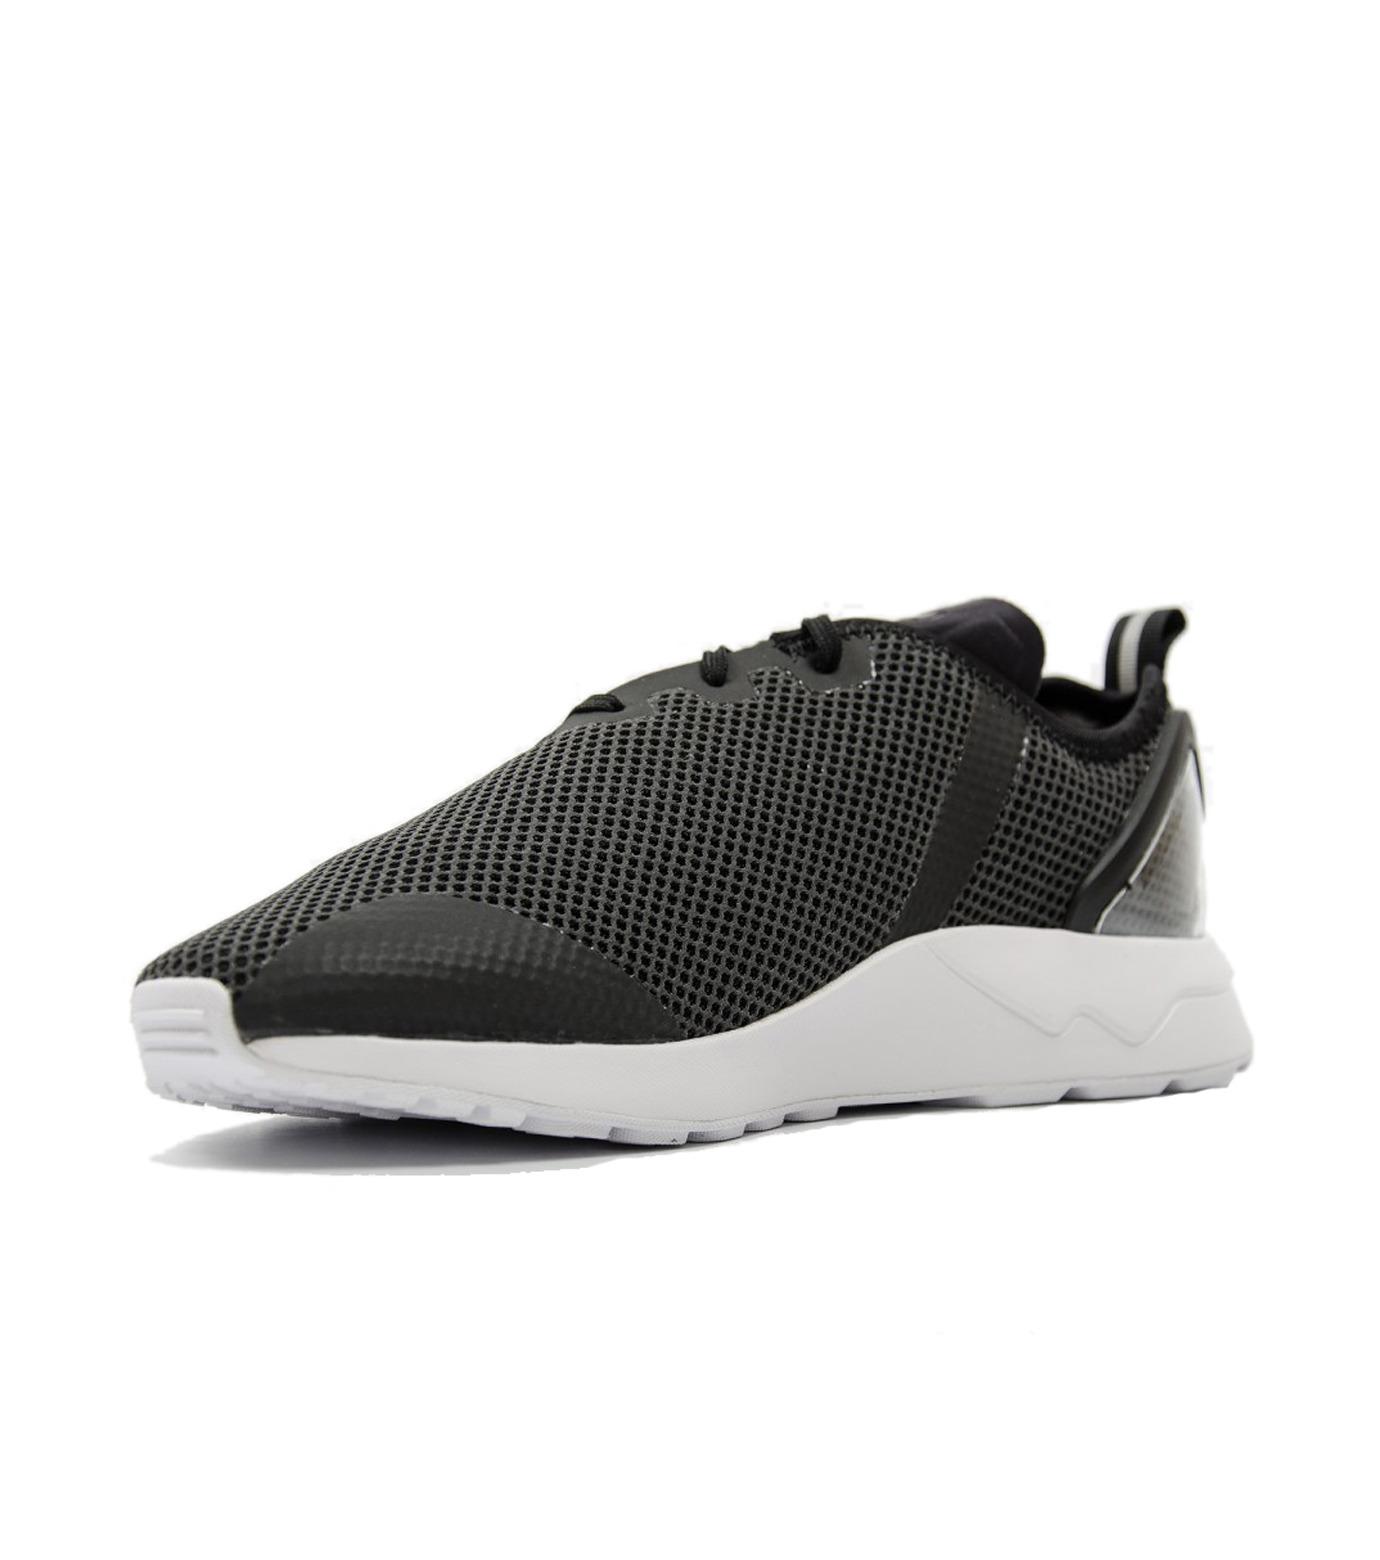 adidas(アディダス)のZX FLUX RCASYM-BLACK(シューズ/shoes)-S79050-13 拡大詳細画像2